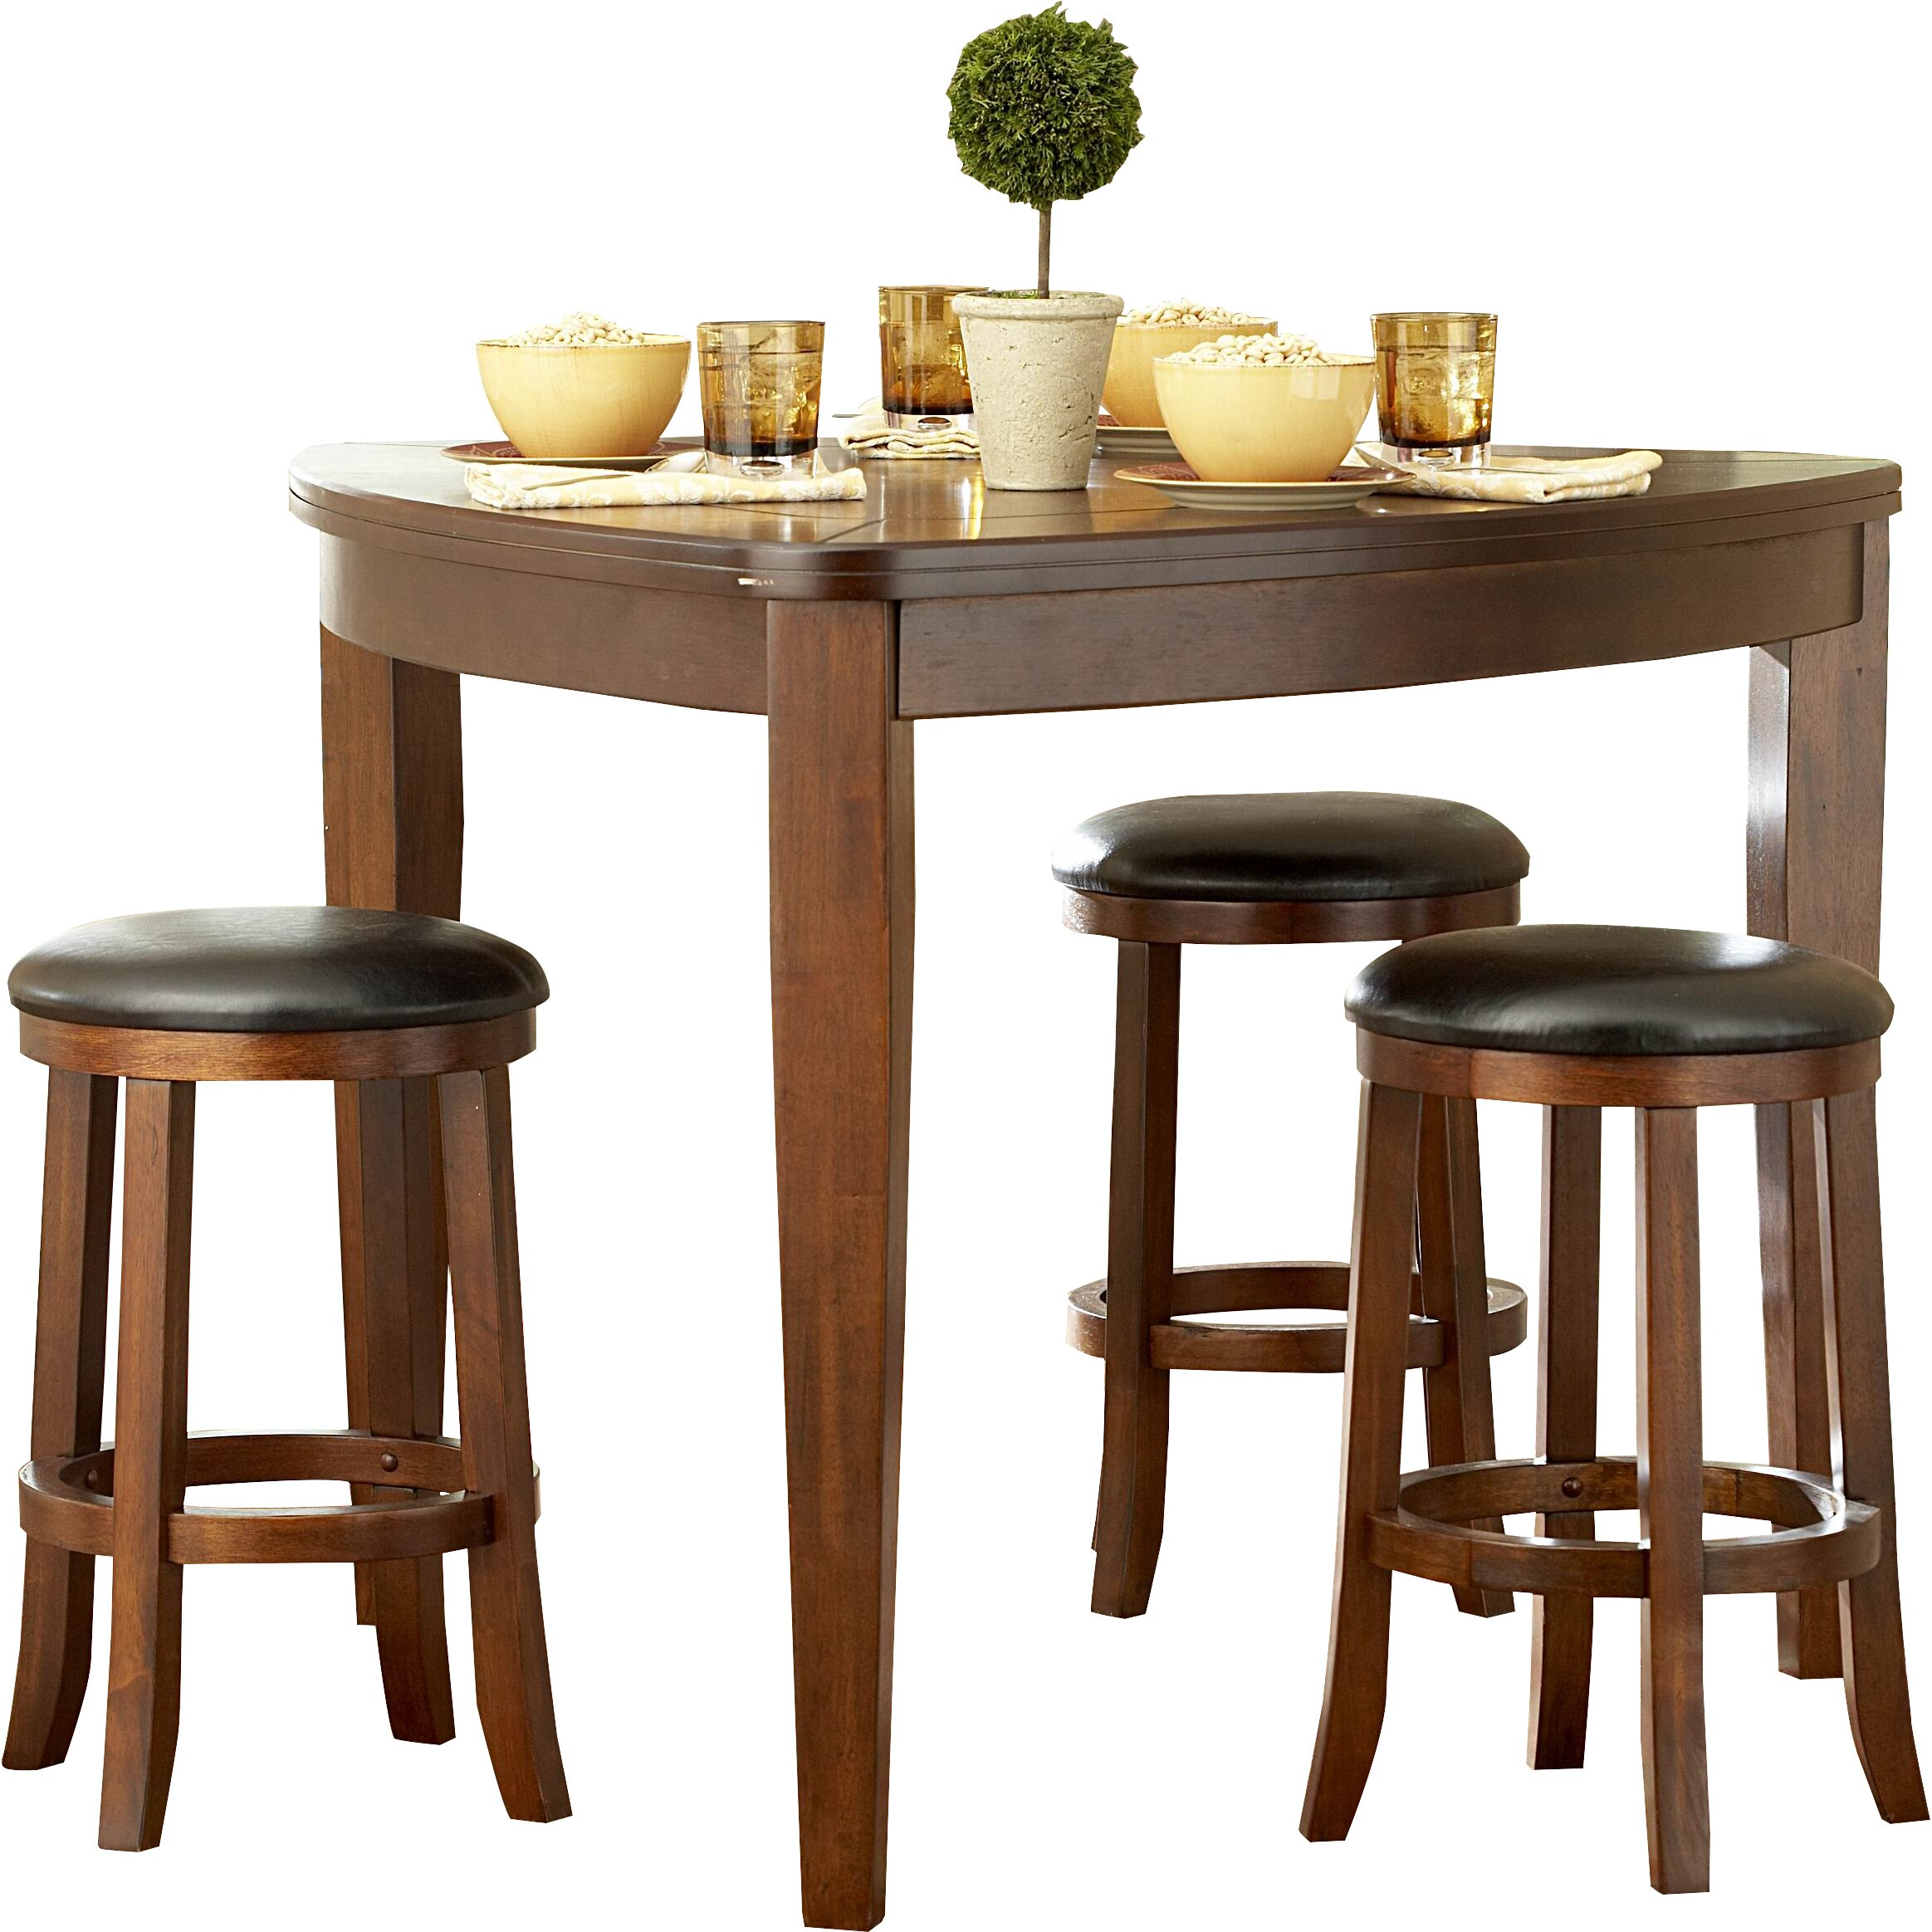 Backbone triangle counter height table wayfair - Triangle counter height dining set ...